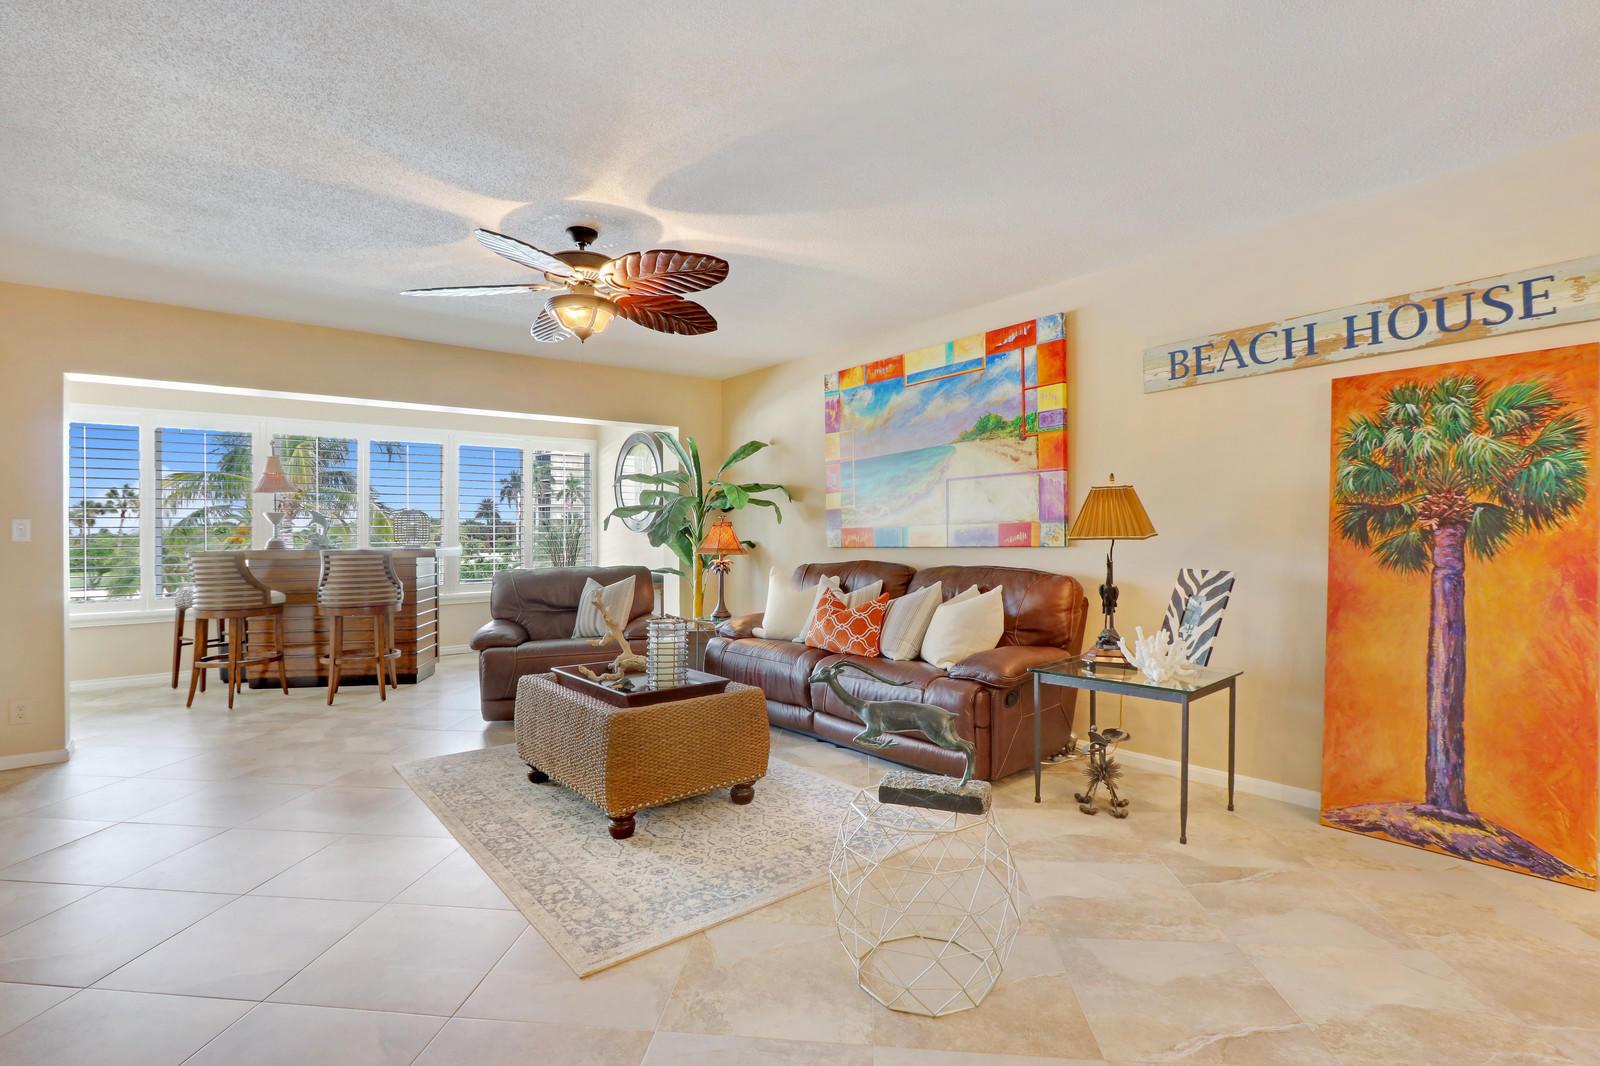 325 Beach Road 304, Jupiter, Florida 33469, 2 Bedrooms Bedrooms, ,2 BathroomsBathrooms,A,Condominium,Beach,RX-10484621